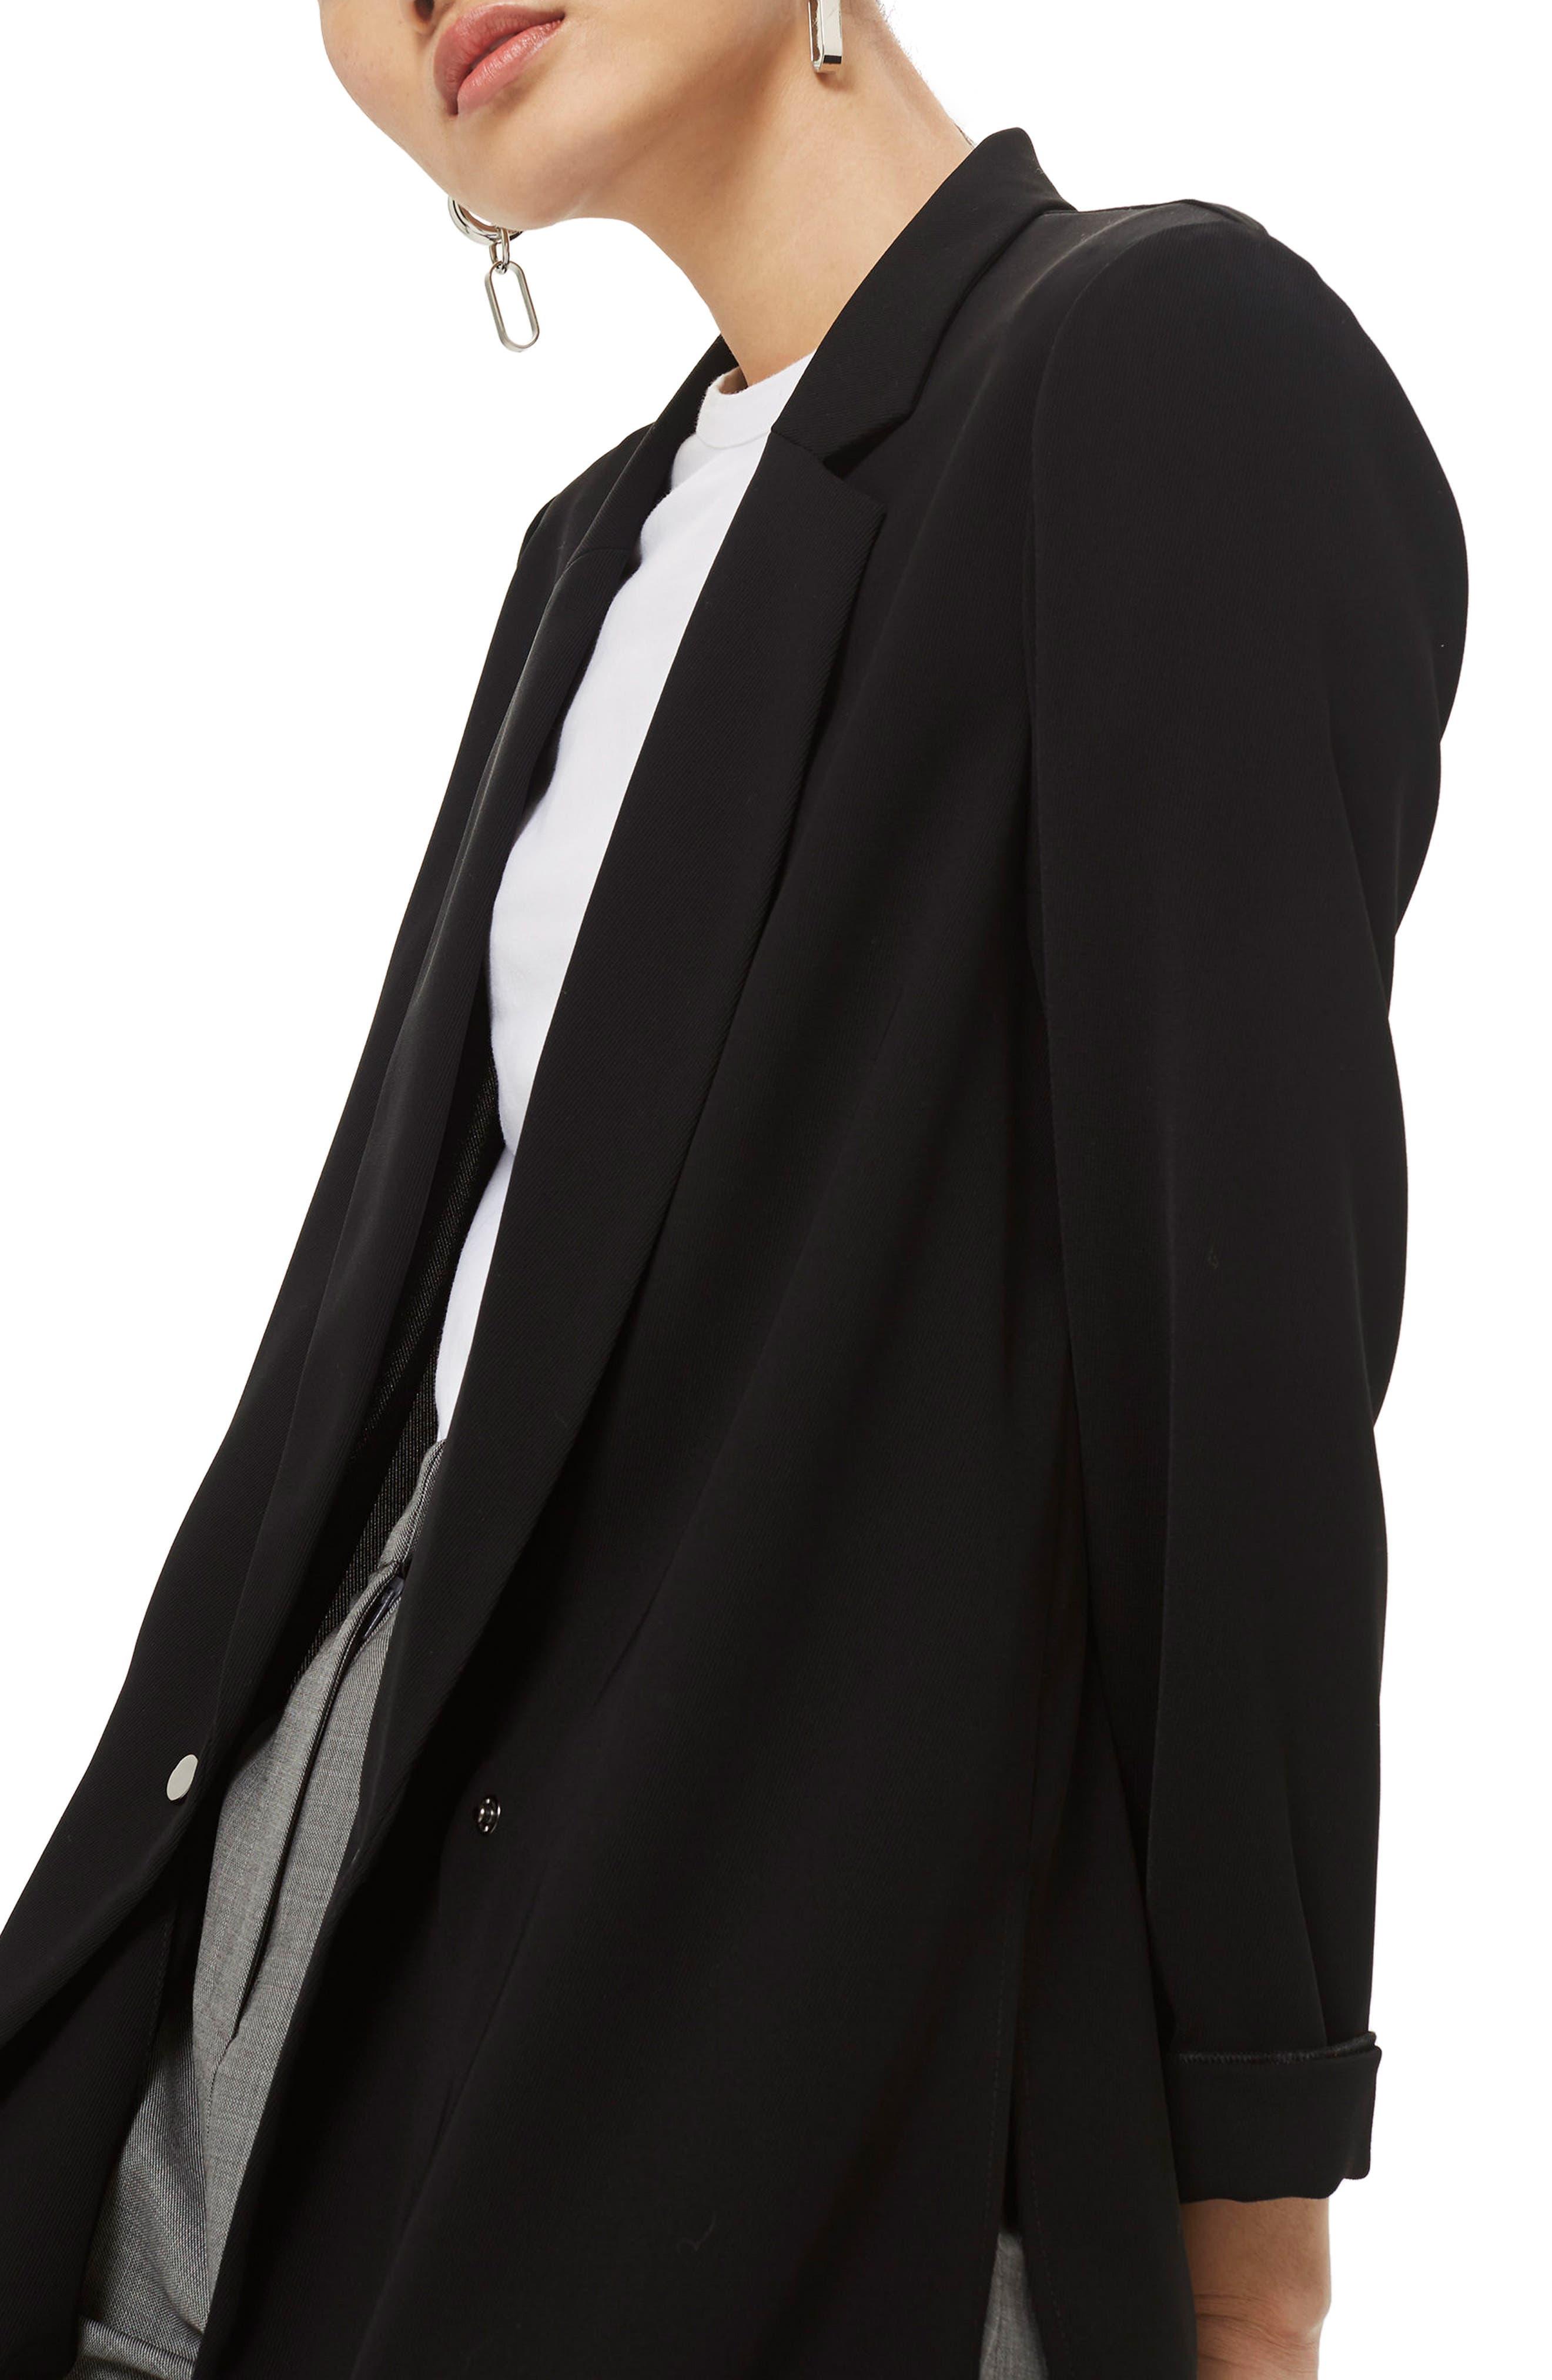 Jackets Topshop Women's amp; Nordstrom Coats tOt10wdq